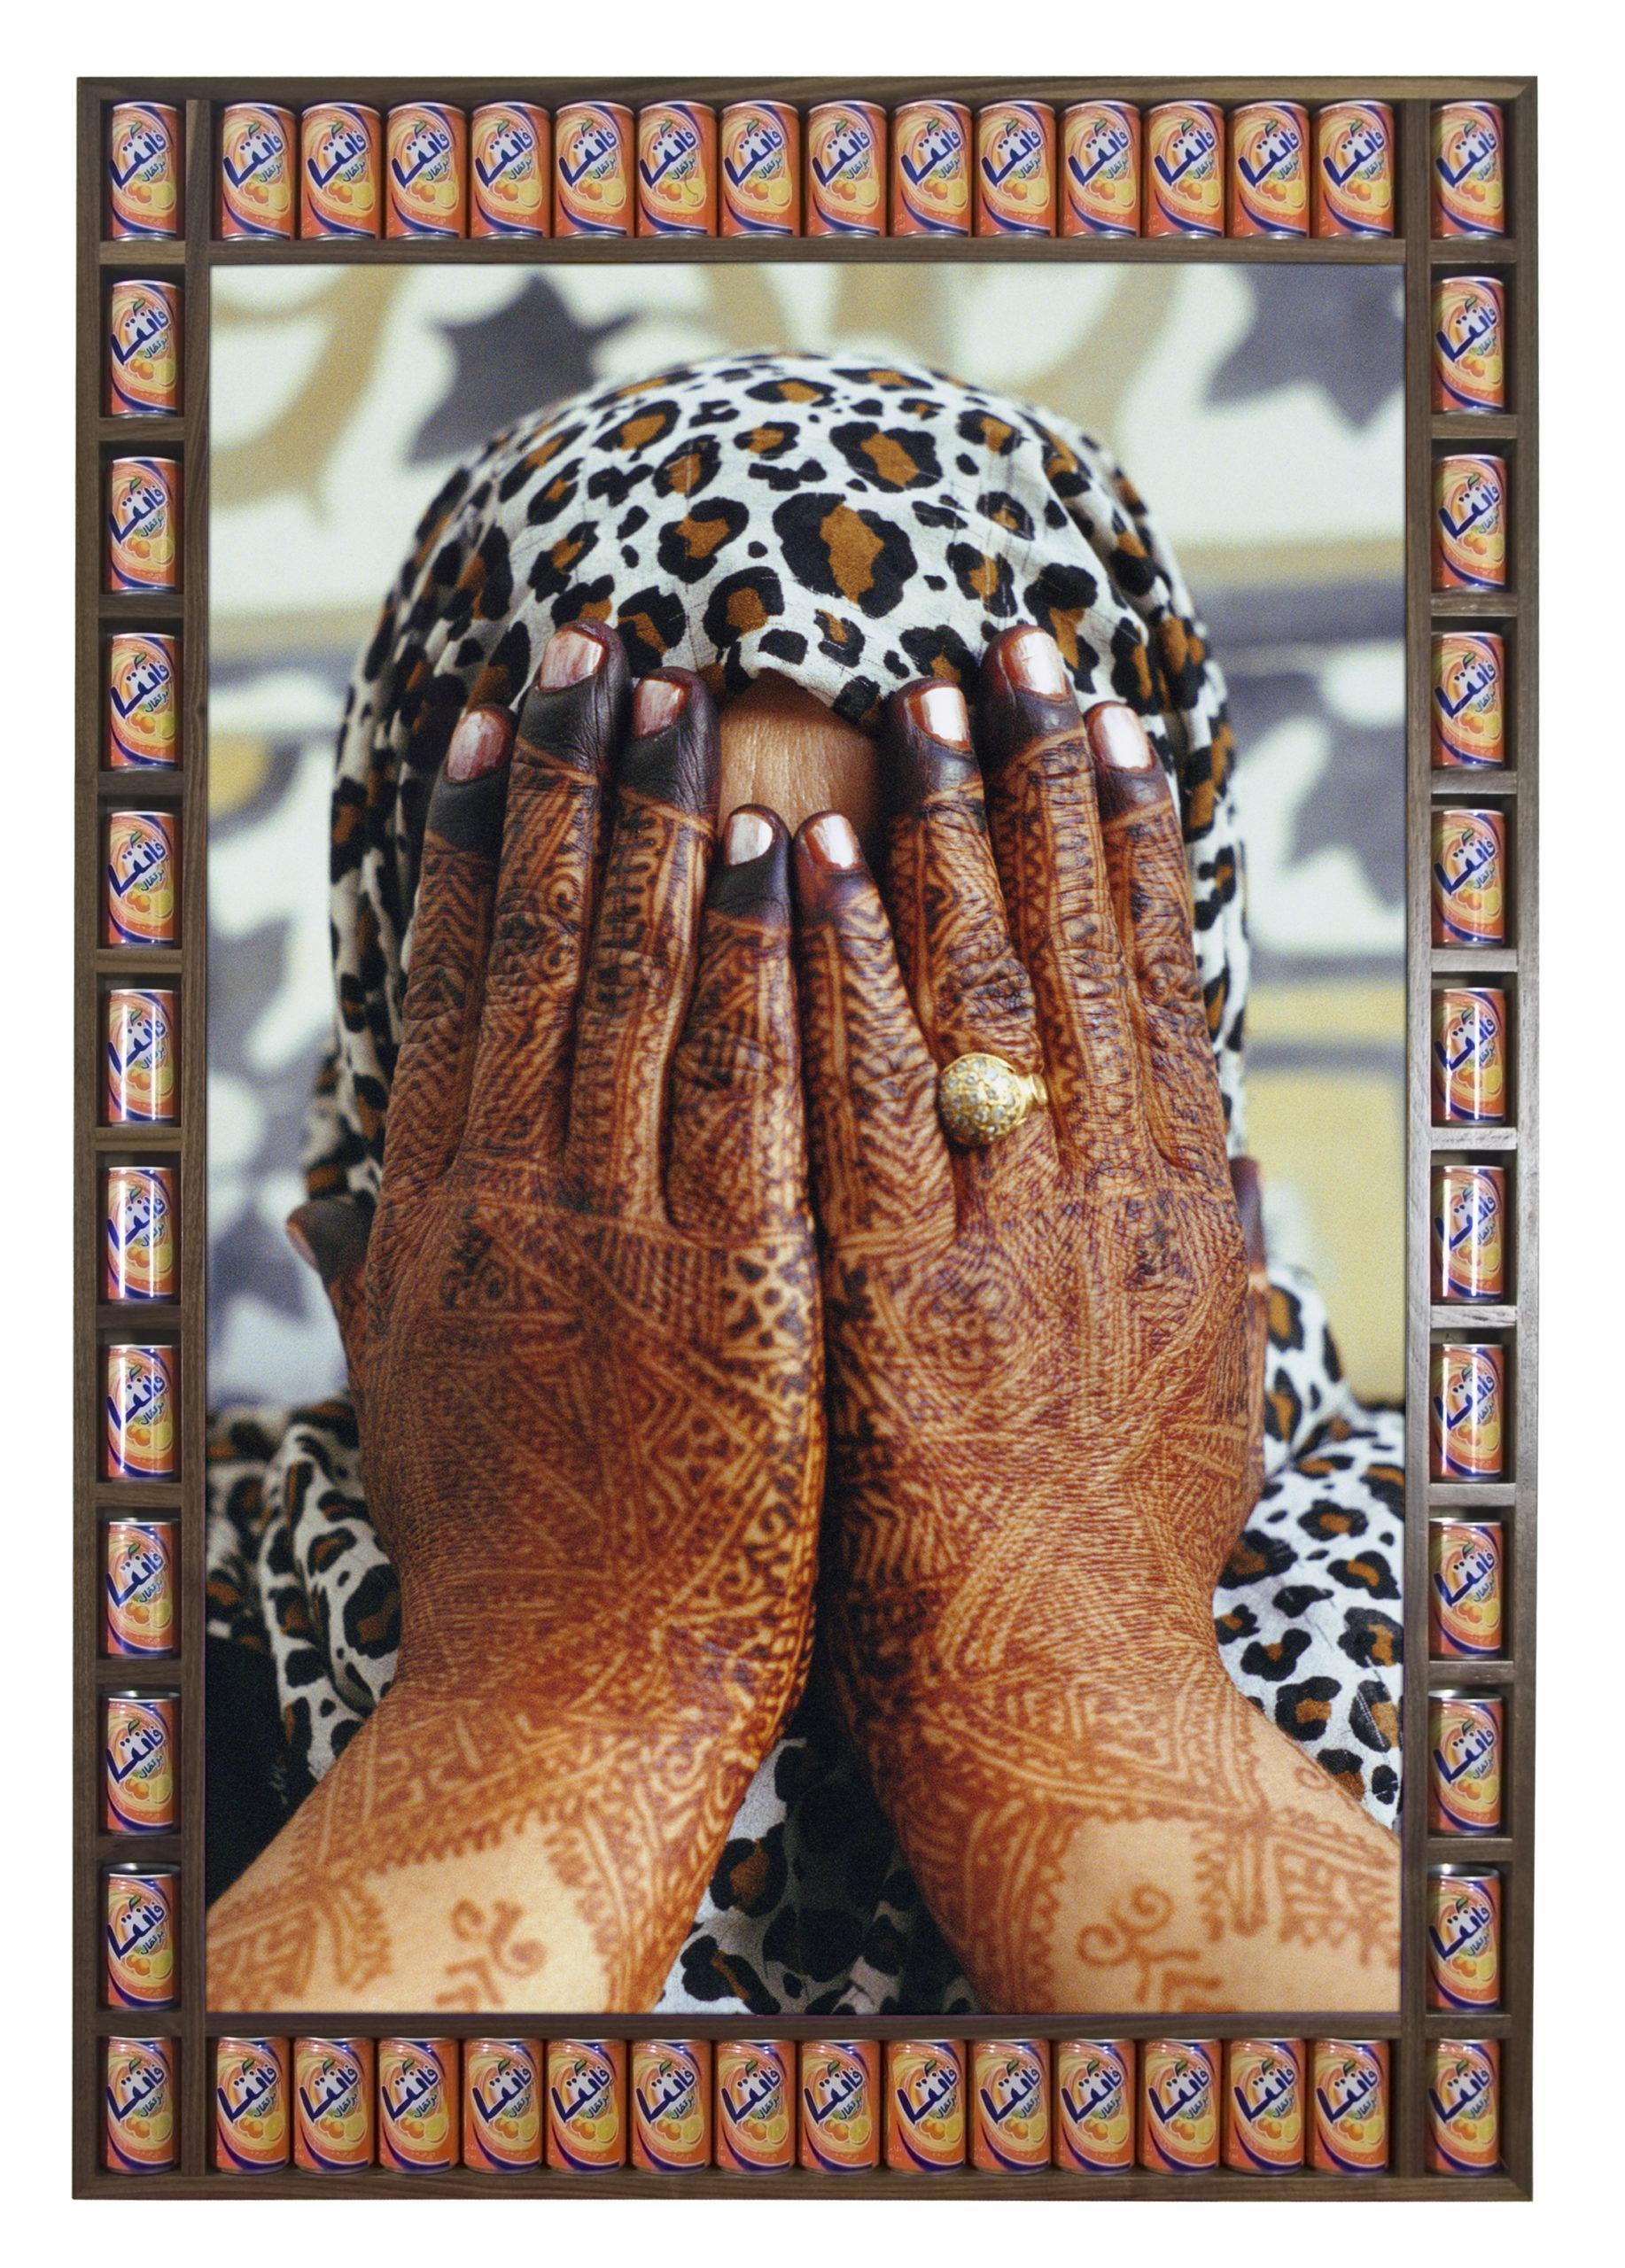 Hassan Hajjaj, Les Mains, 2000/1421. Courtesy the artist